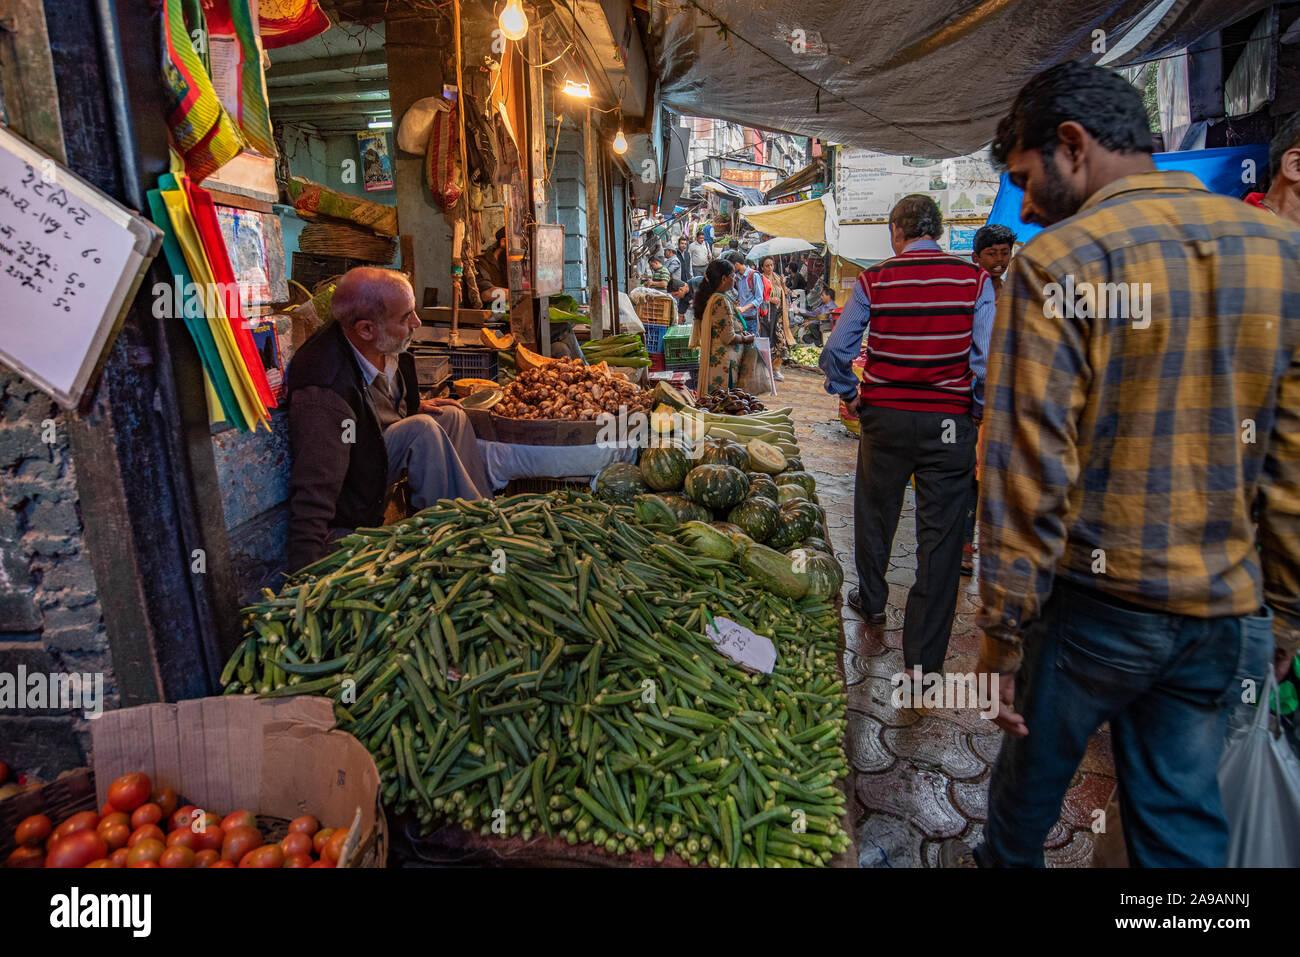 Sabzi mandi, or vegetable market, Shimla, Himachal Pradesh Stock Photo